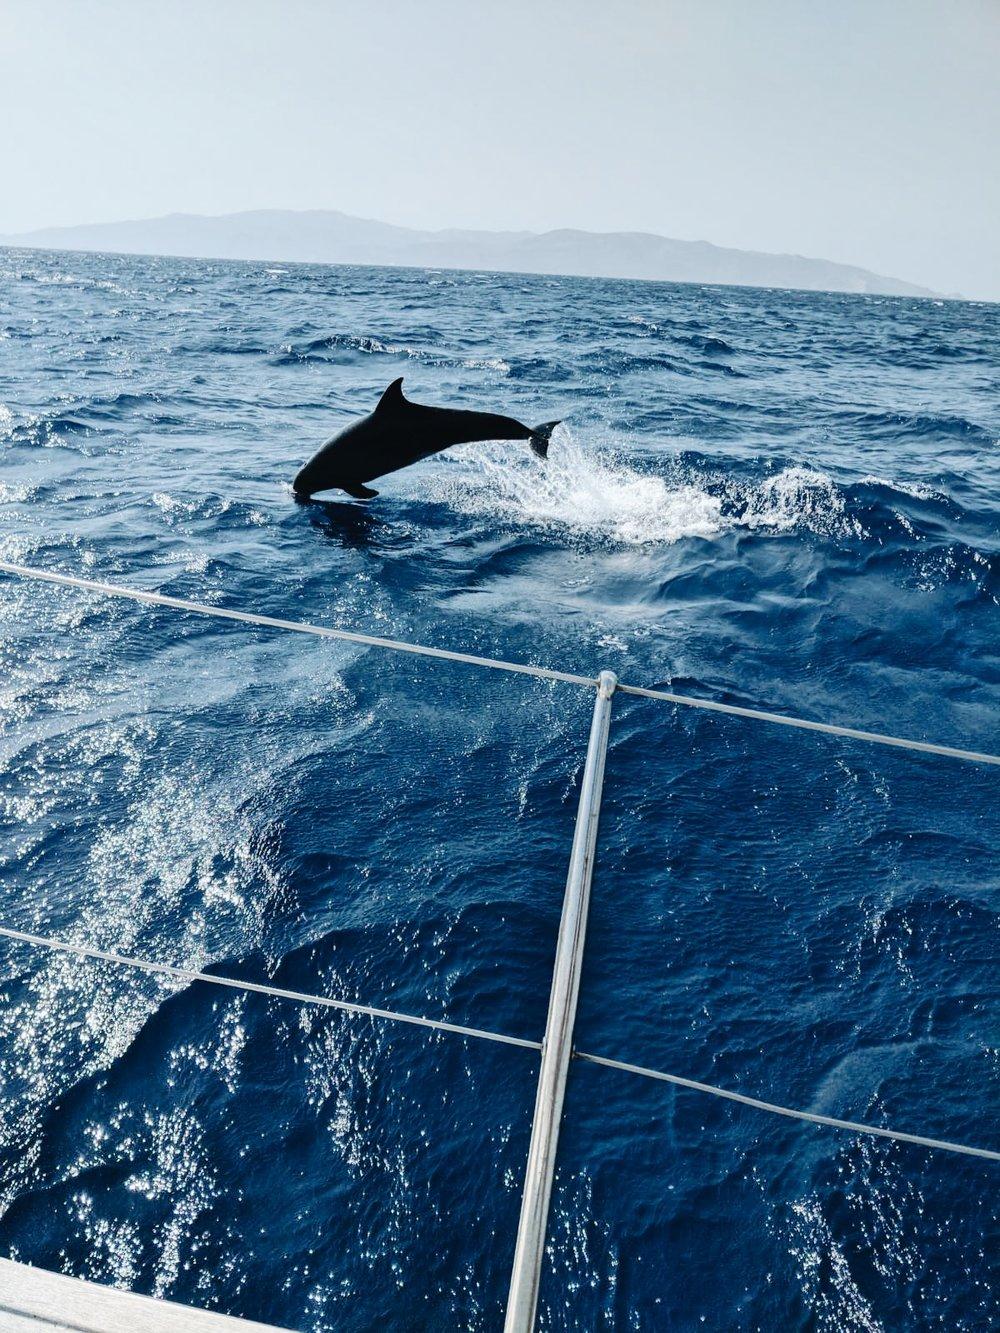 Dolphin spotting near Paros, Greece